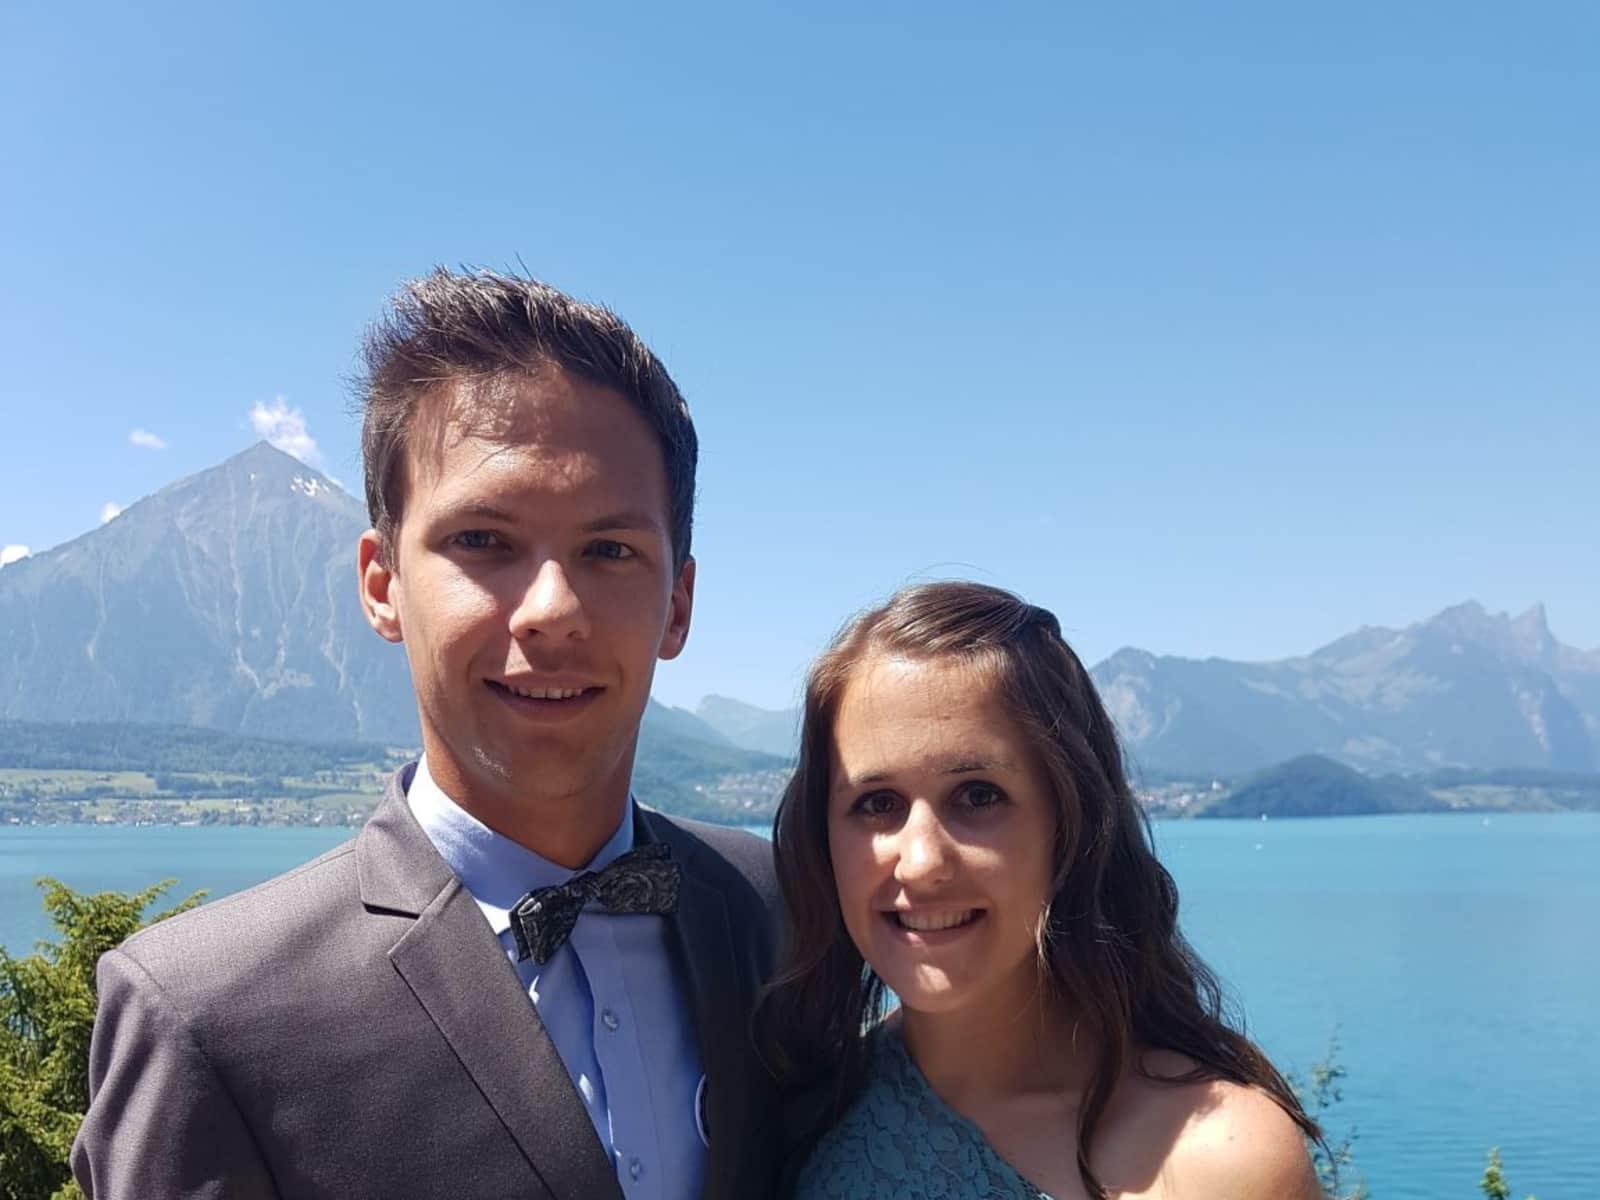 Norina & Fabian from Zürich, Switzerland